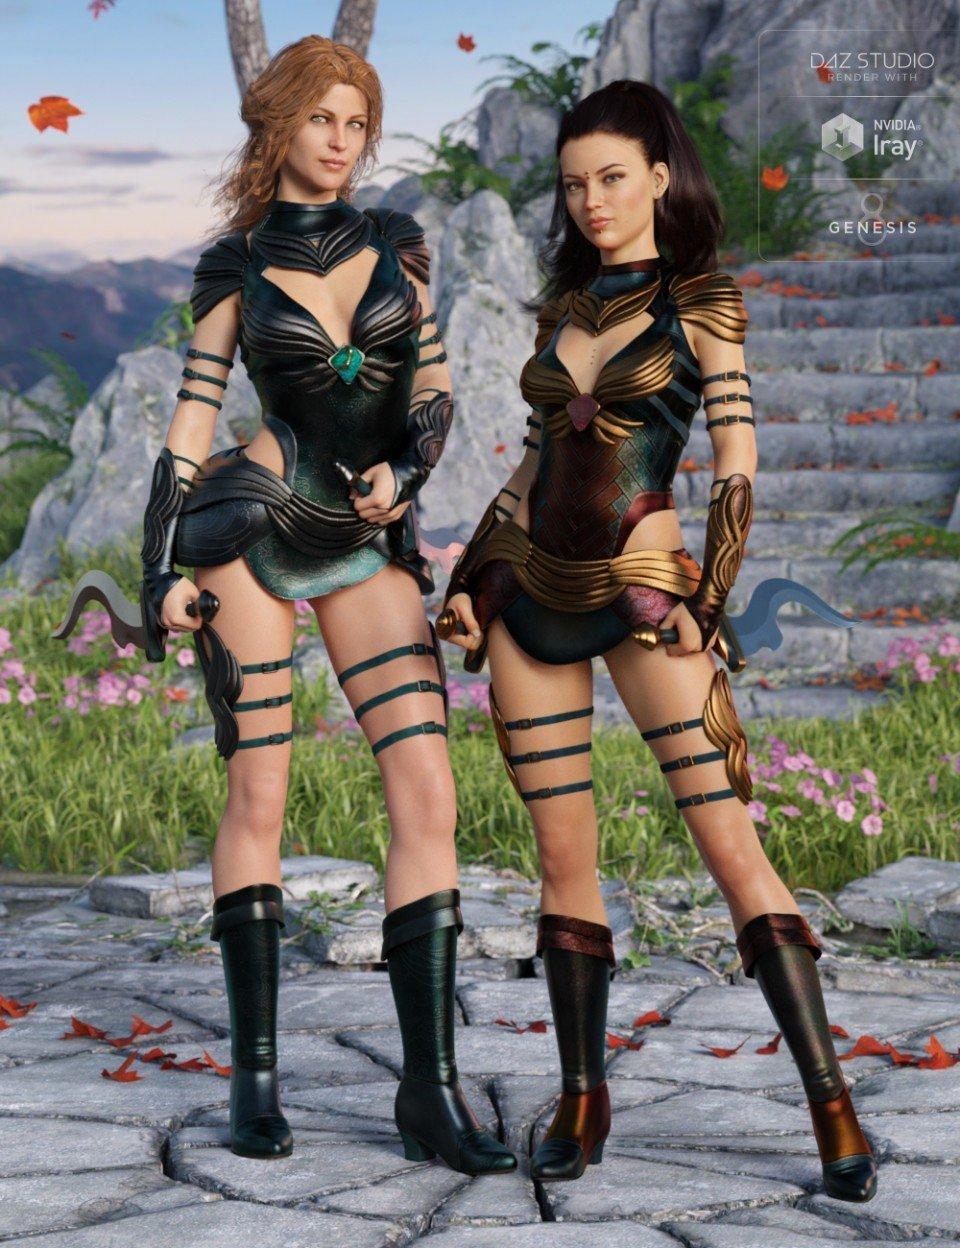 Gemini Warrior Outfit Textures_DAZ3D下载站